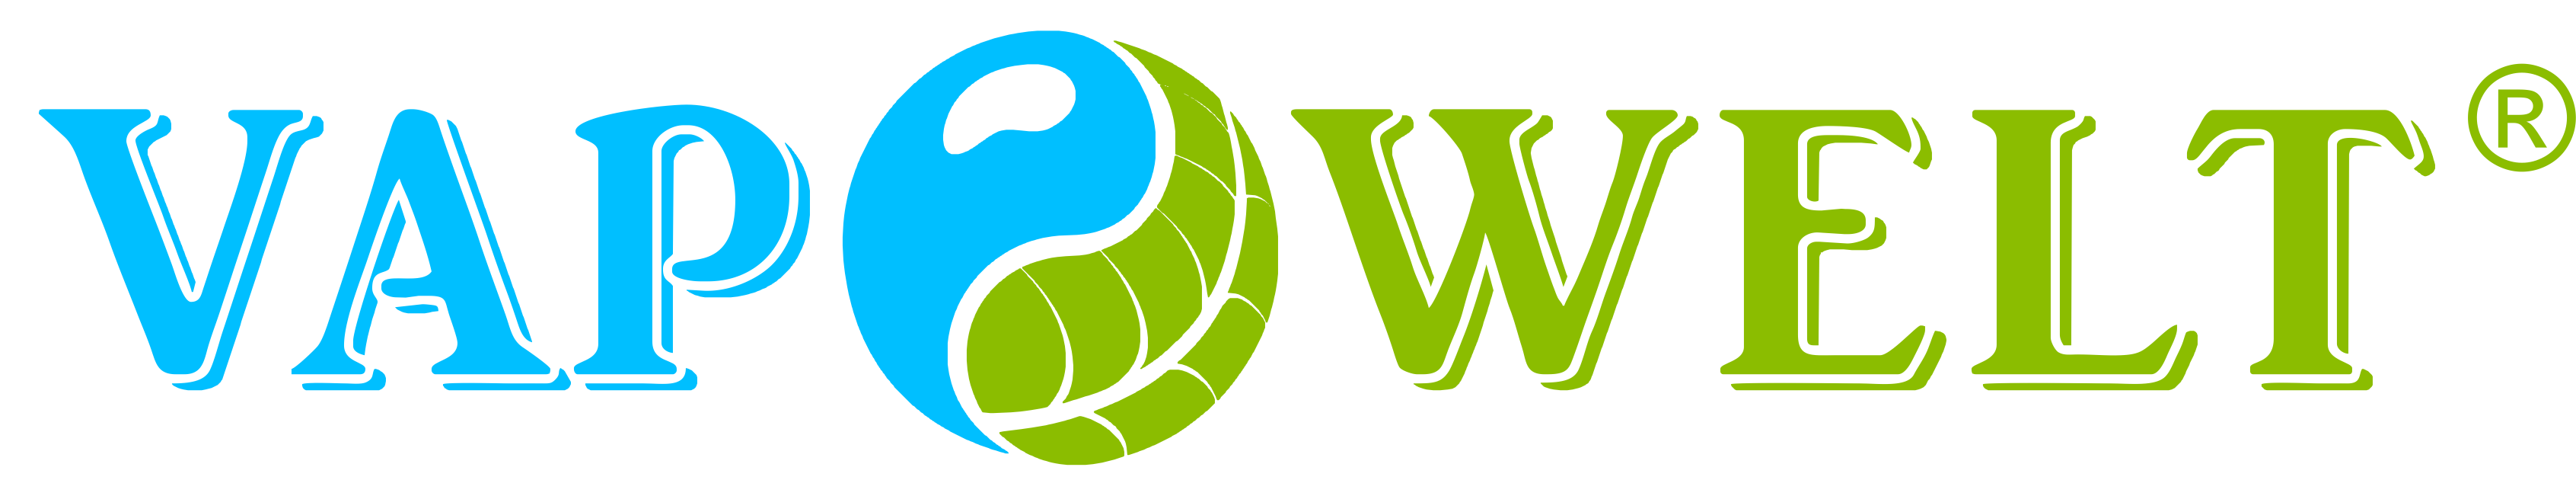 Vapowelt